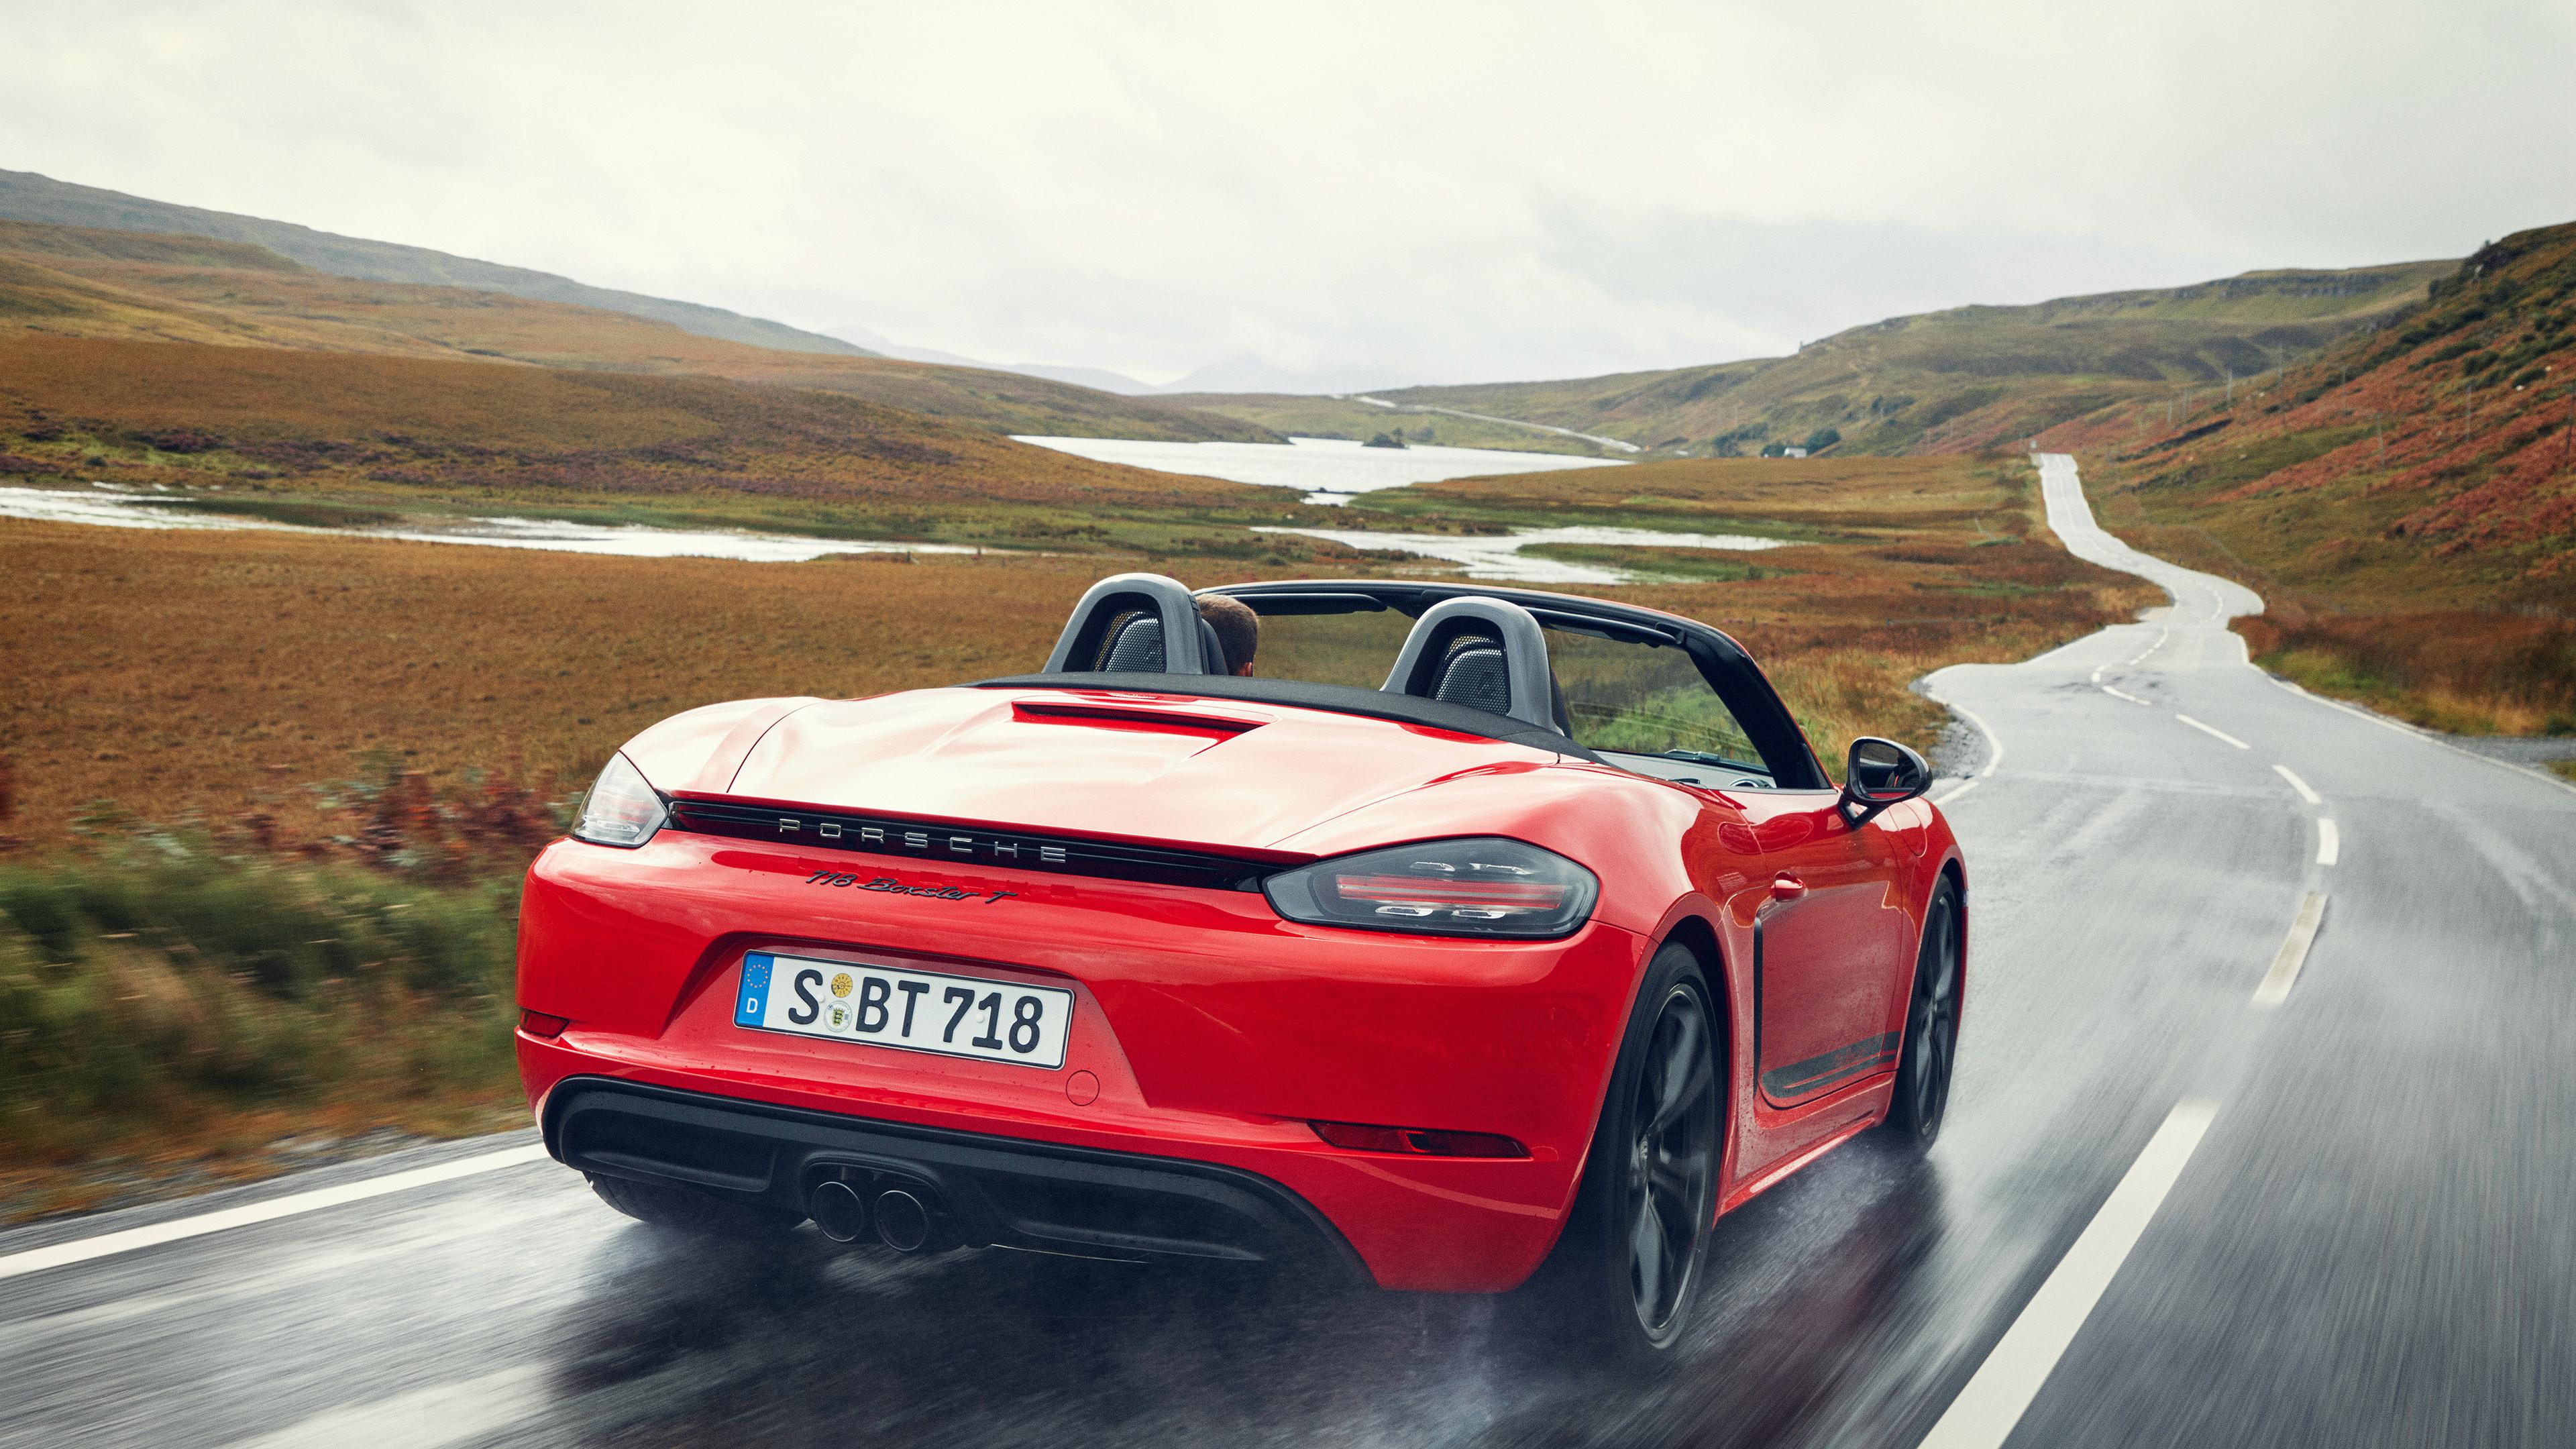 porsche 718 4k 1546362386 - Porsche 718 4k - porsche wallpapers, porsche 718 wallpapers, hd-wallpapers, cars wallpapers, 4k-wallpapers, 2018 cars wallpapers